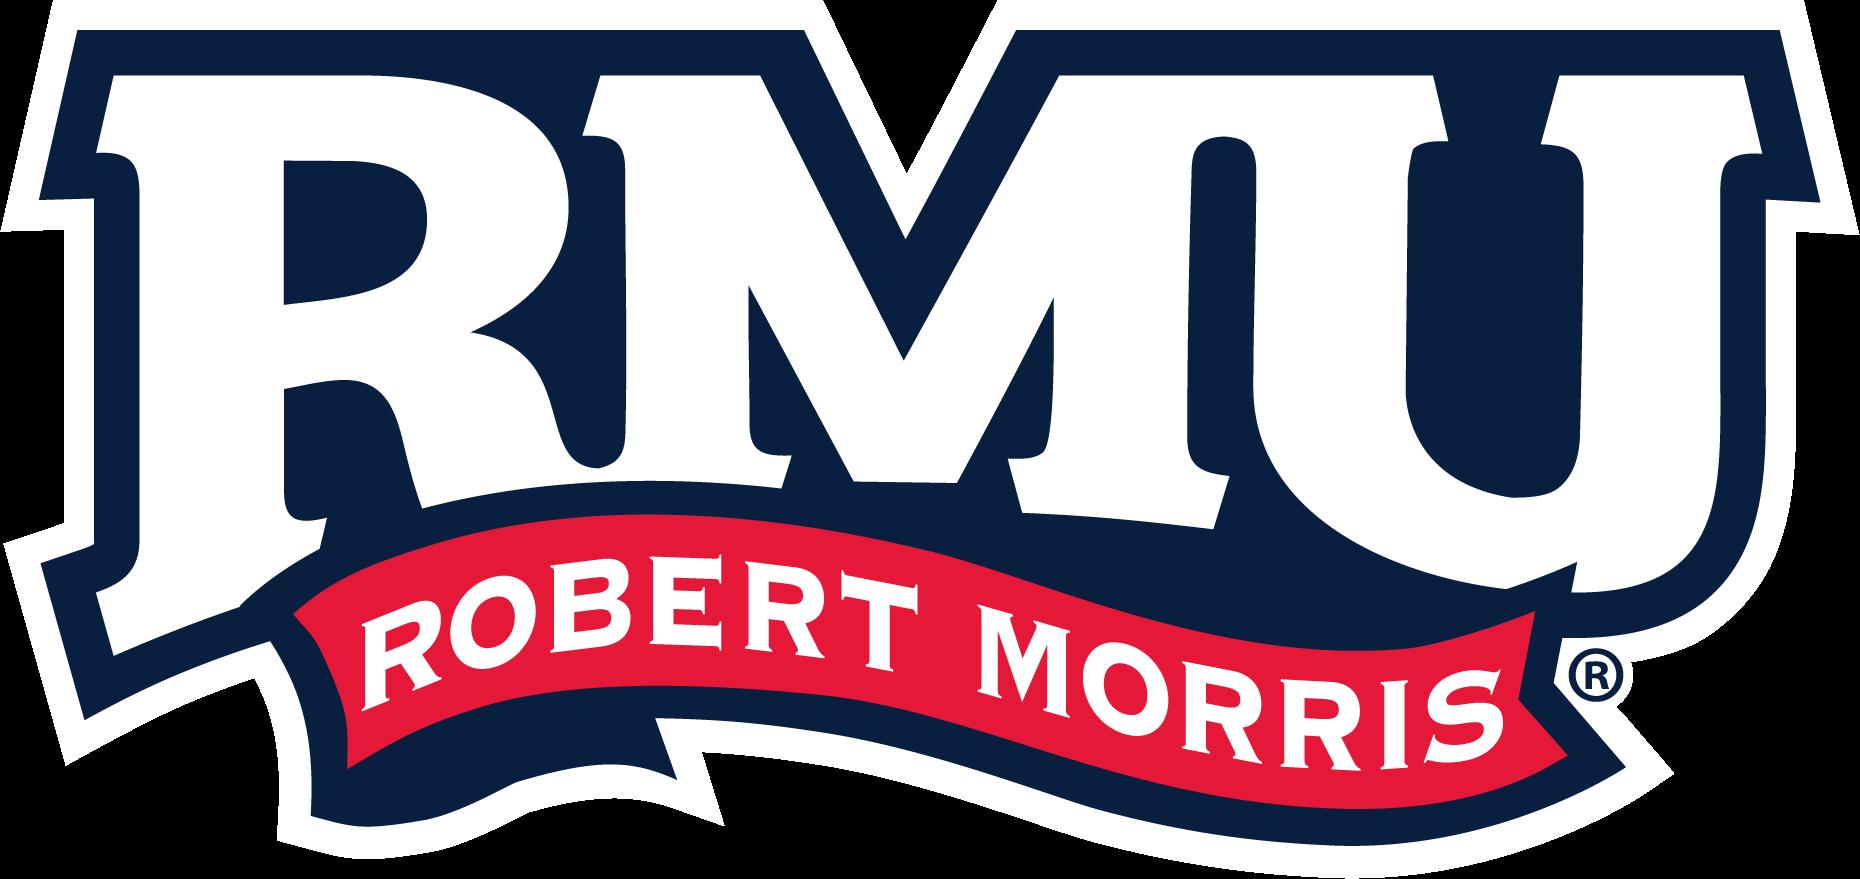 Logos and Identity   Robert Morris University